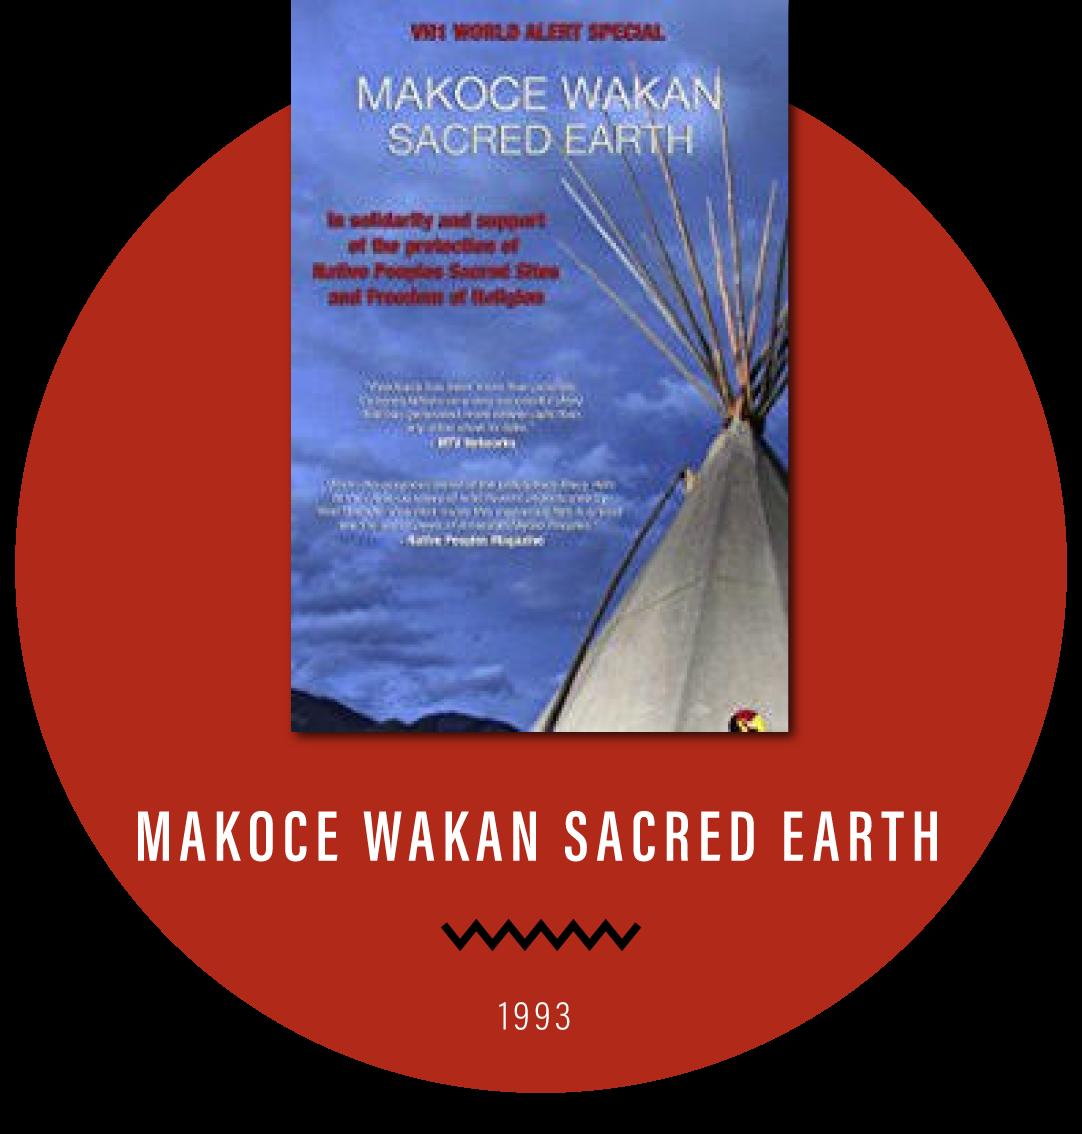 FILM-CARD-makoce-wakan-NEW.png